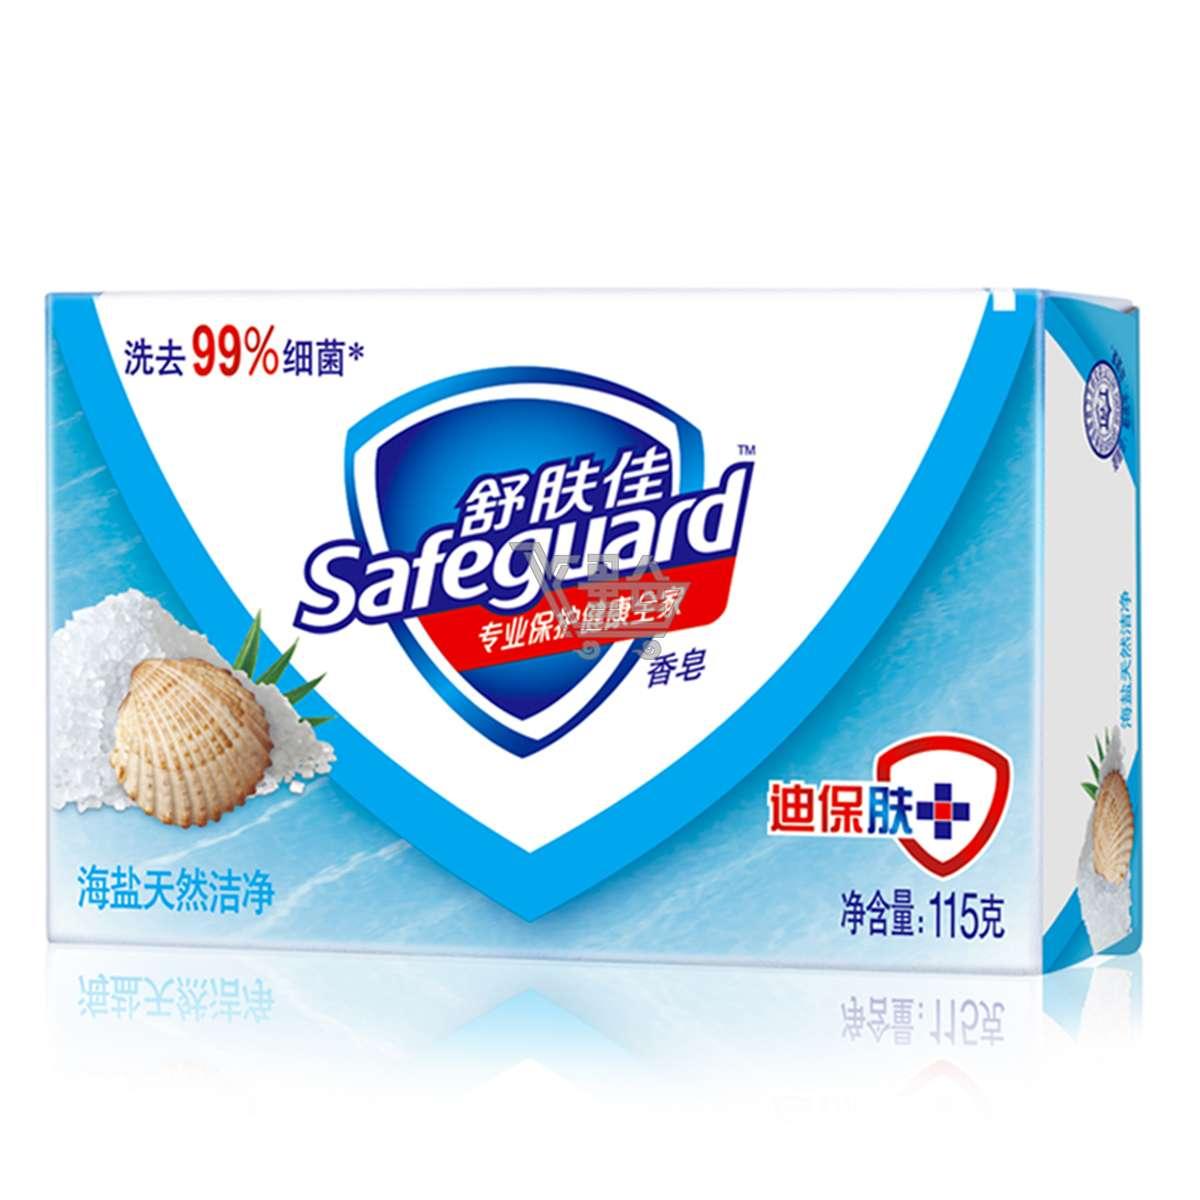 115g舒肤佳香皂(海盐)图片